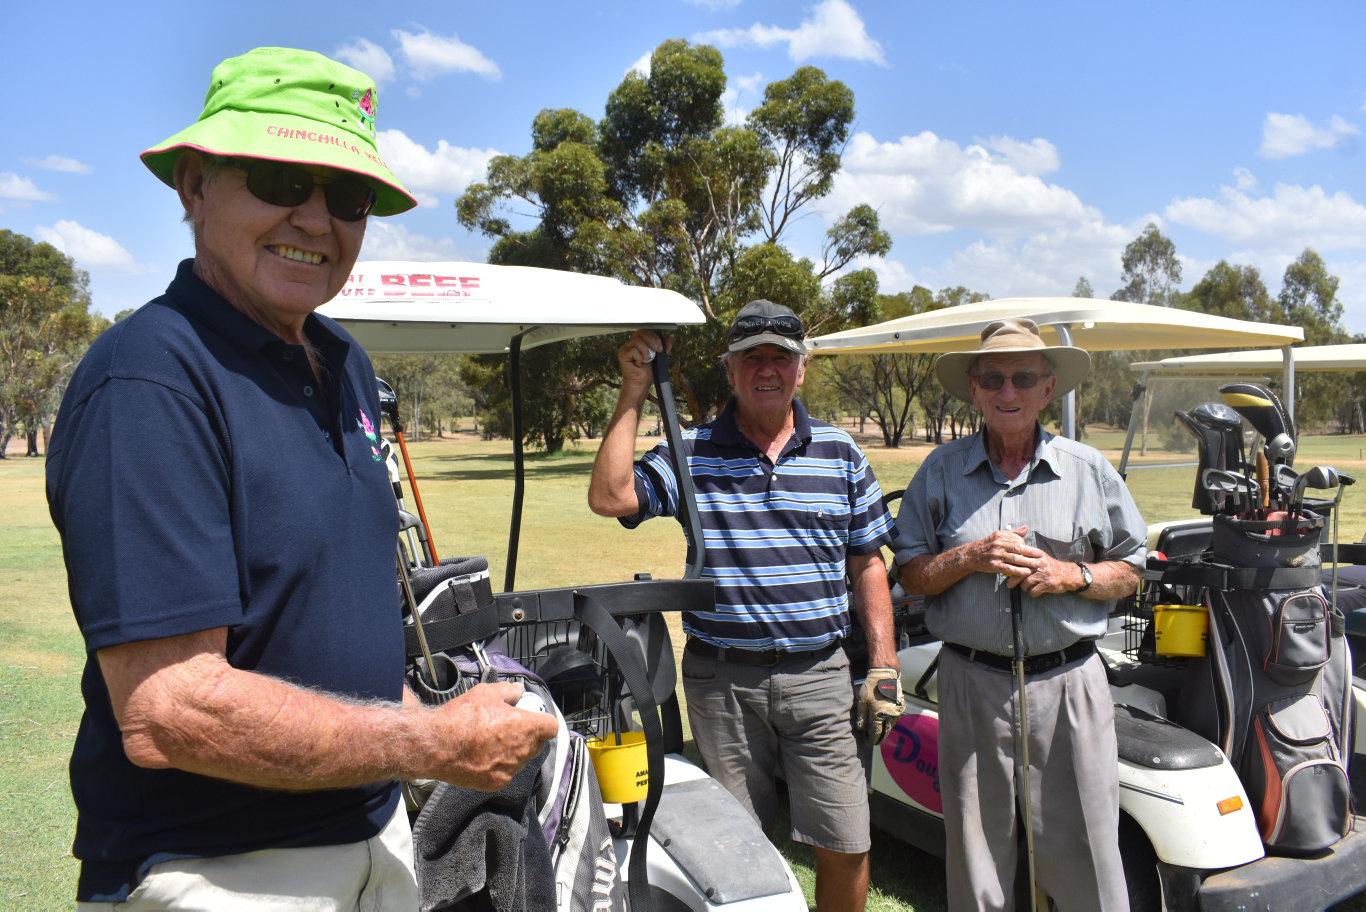 Doug Fields, Doug Haig and Bill Hughes, Chinchilla Golf Tournament, 2019.